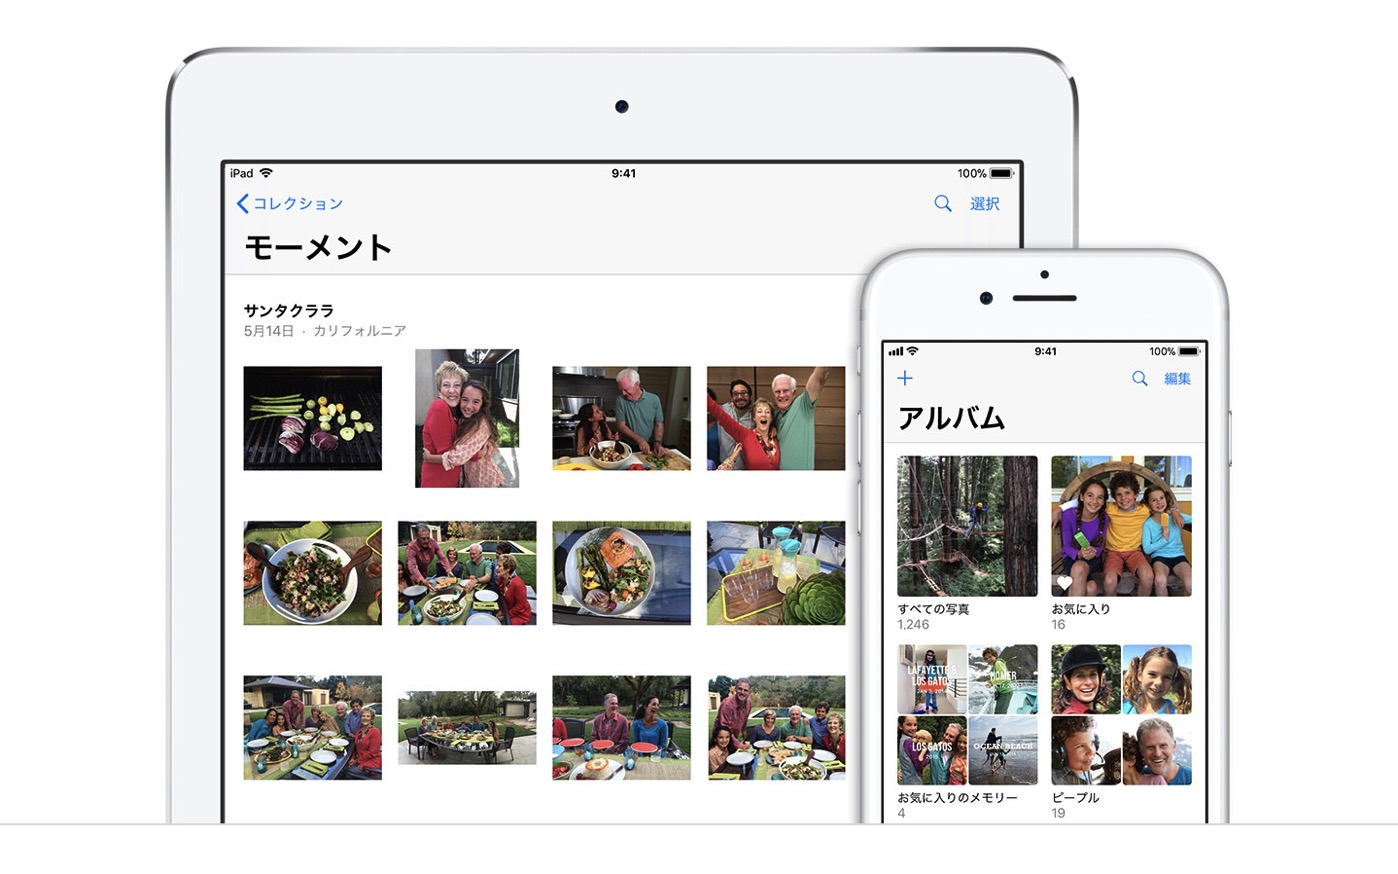 iCloud フォトライブラリとマイフォトストリーム